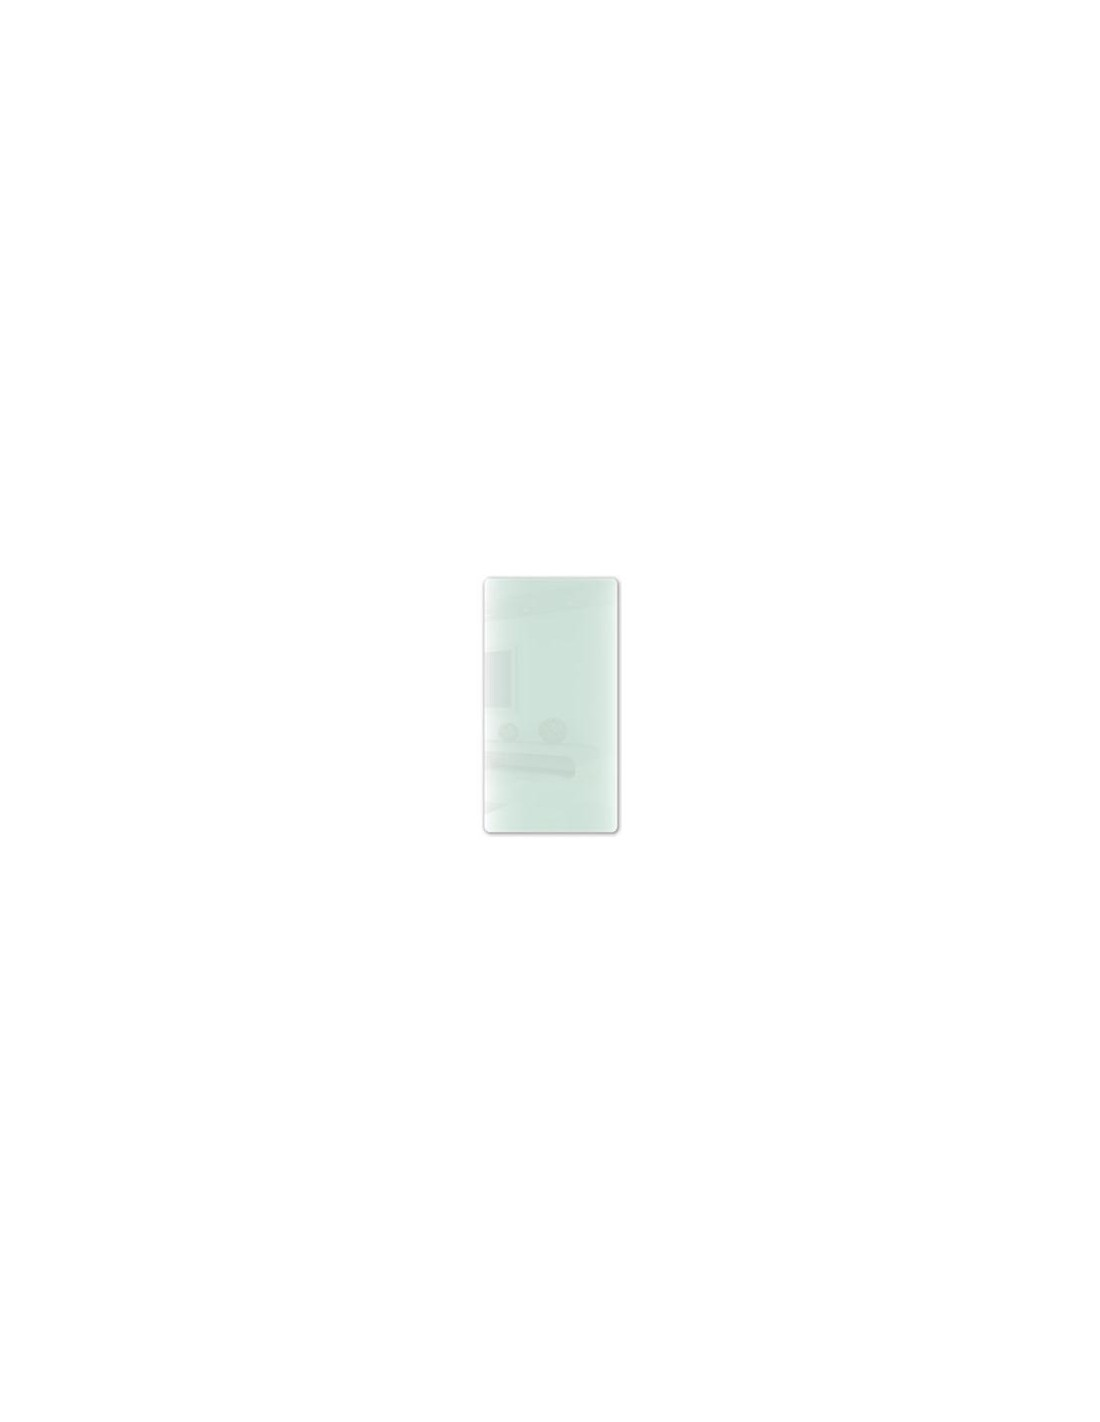 Radiateur Solaris vertical 1200W blanc brillant avec reflets vert de la marque Fondis - Valente Design